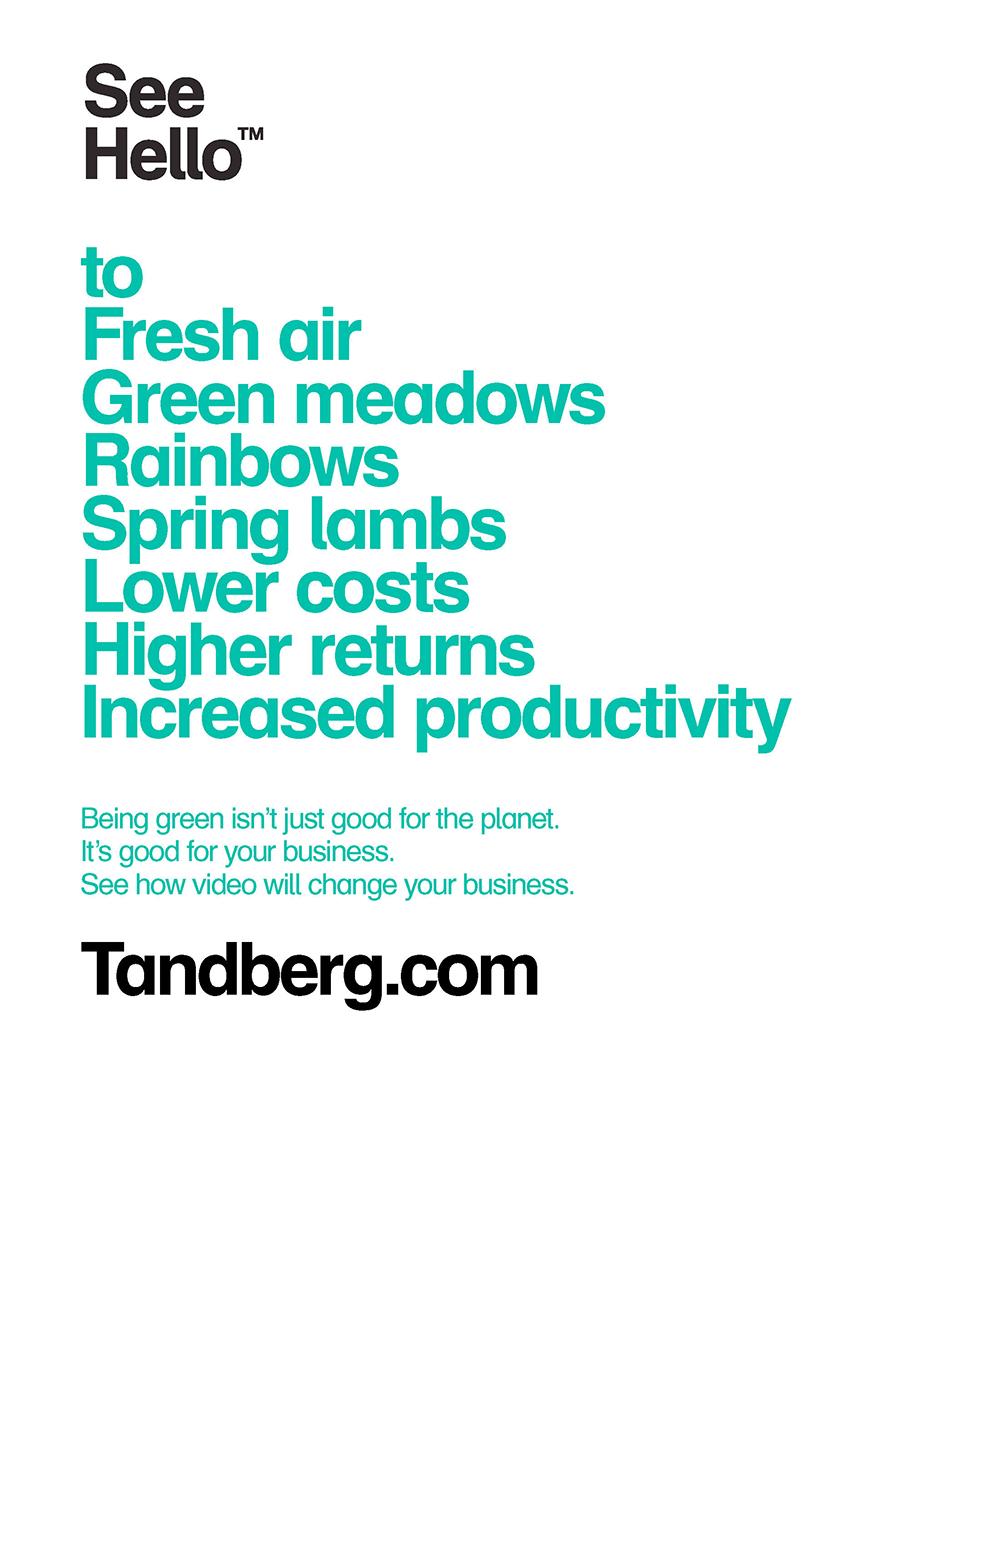 Tandberg_3.jpg